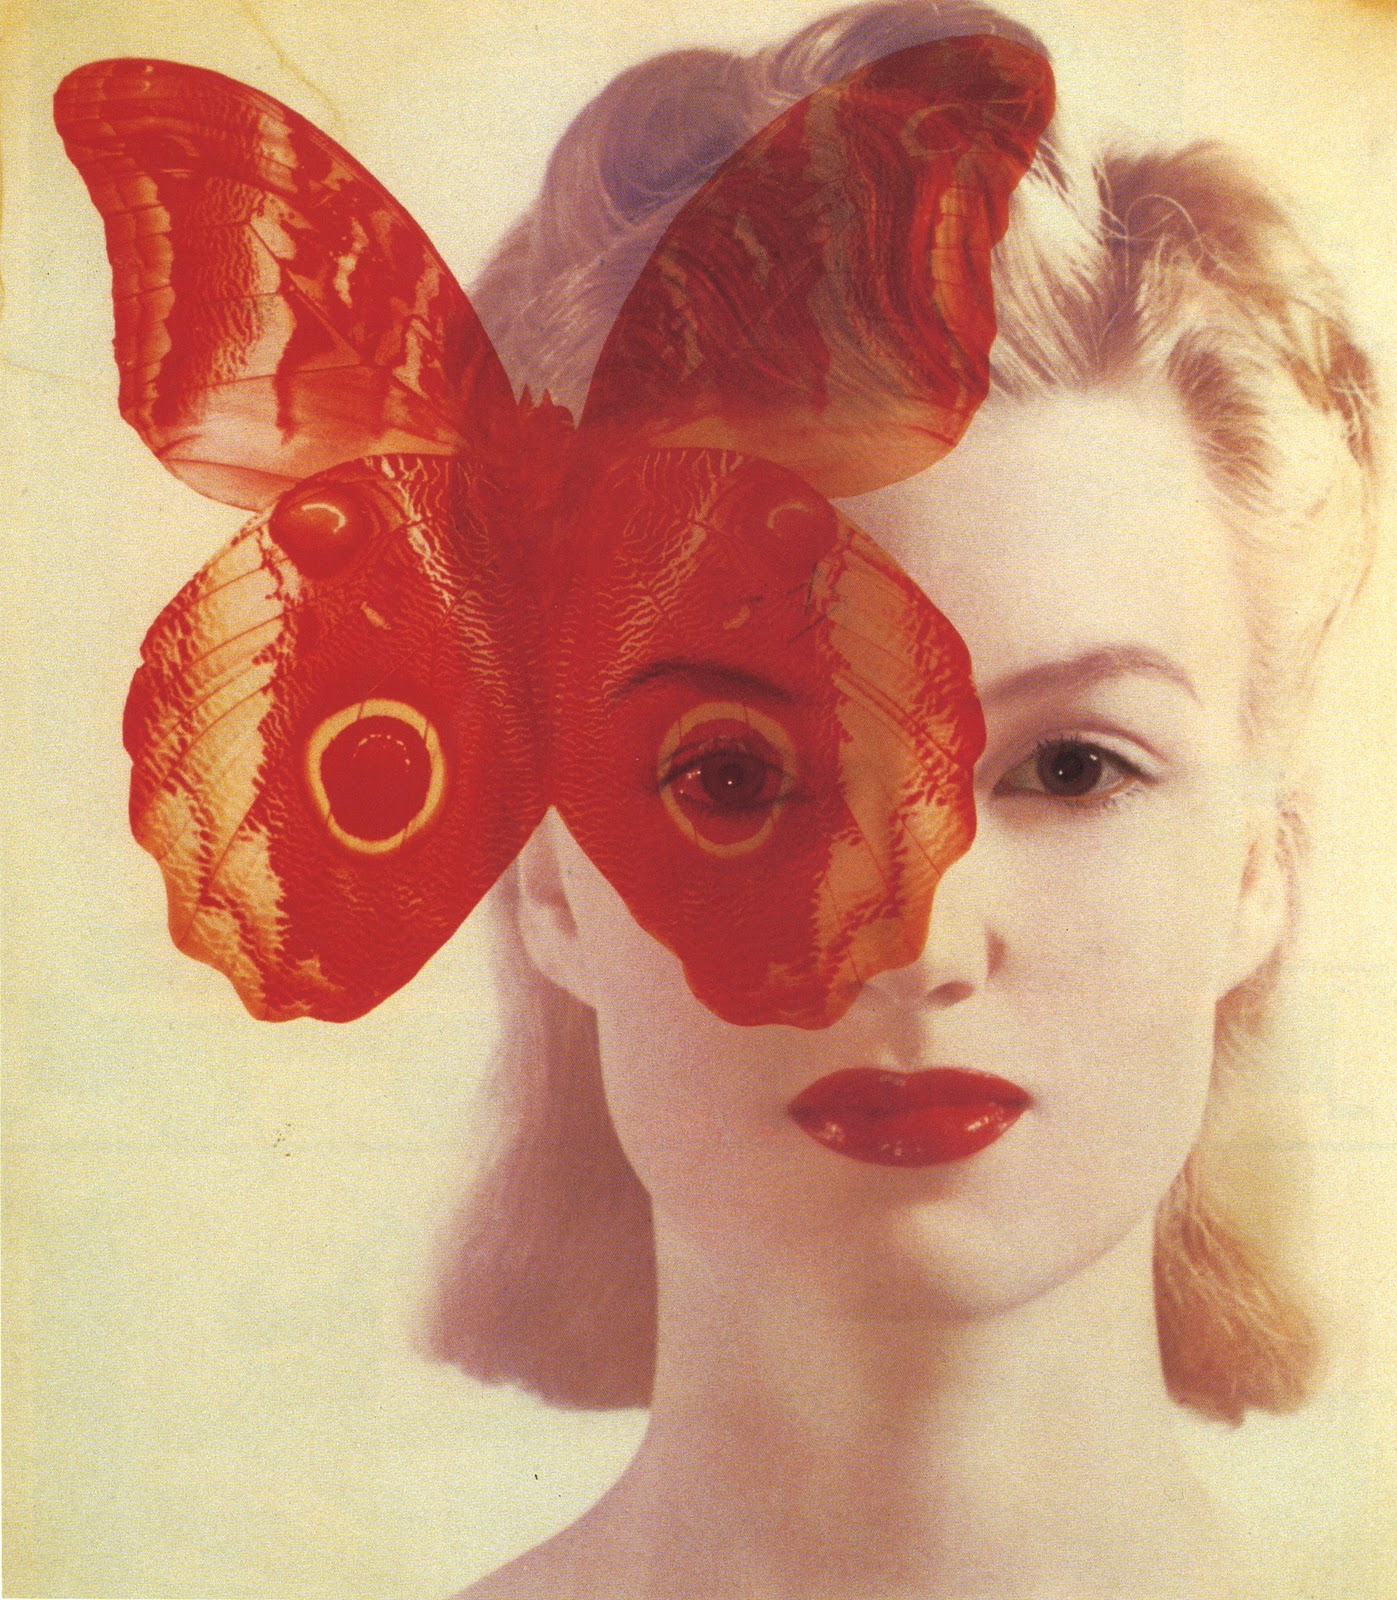 Vintage Summer Vogue Covers